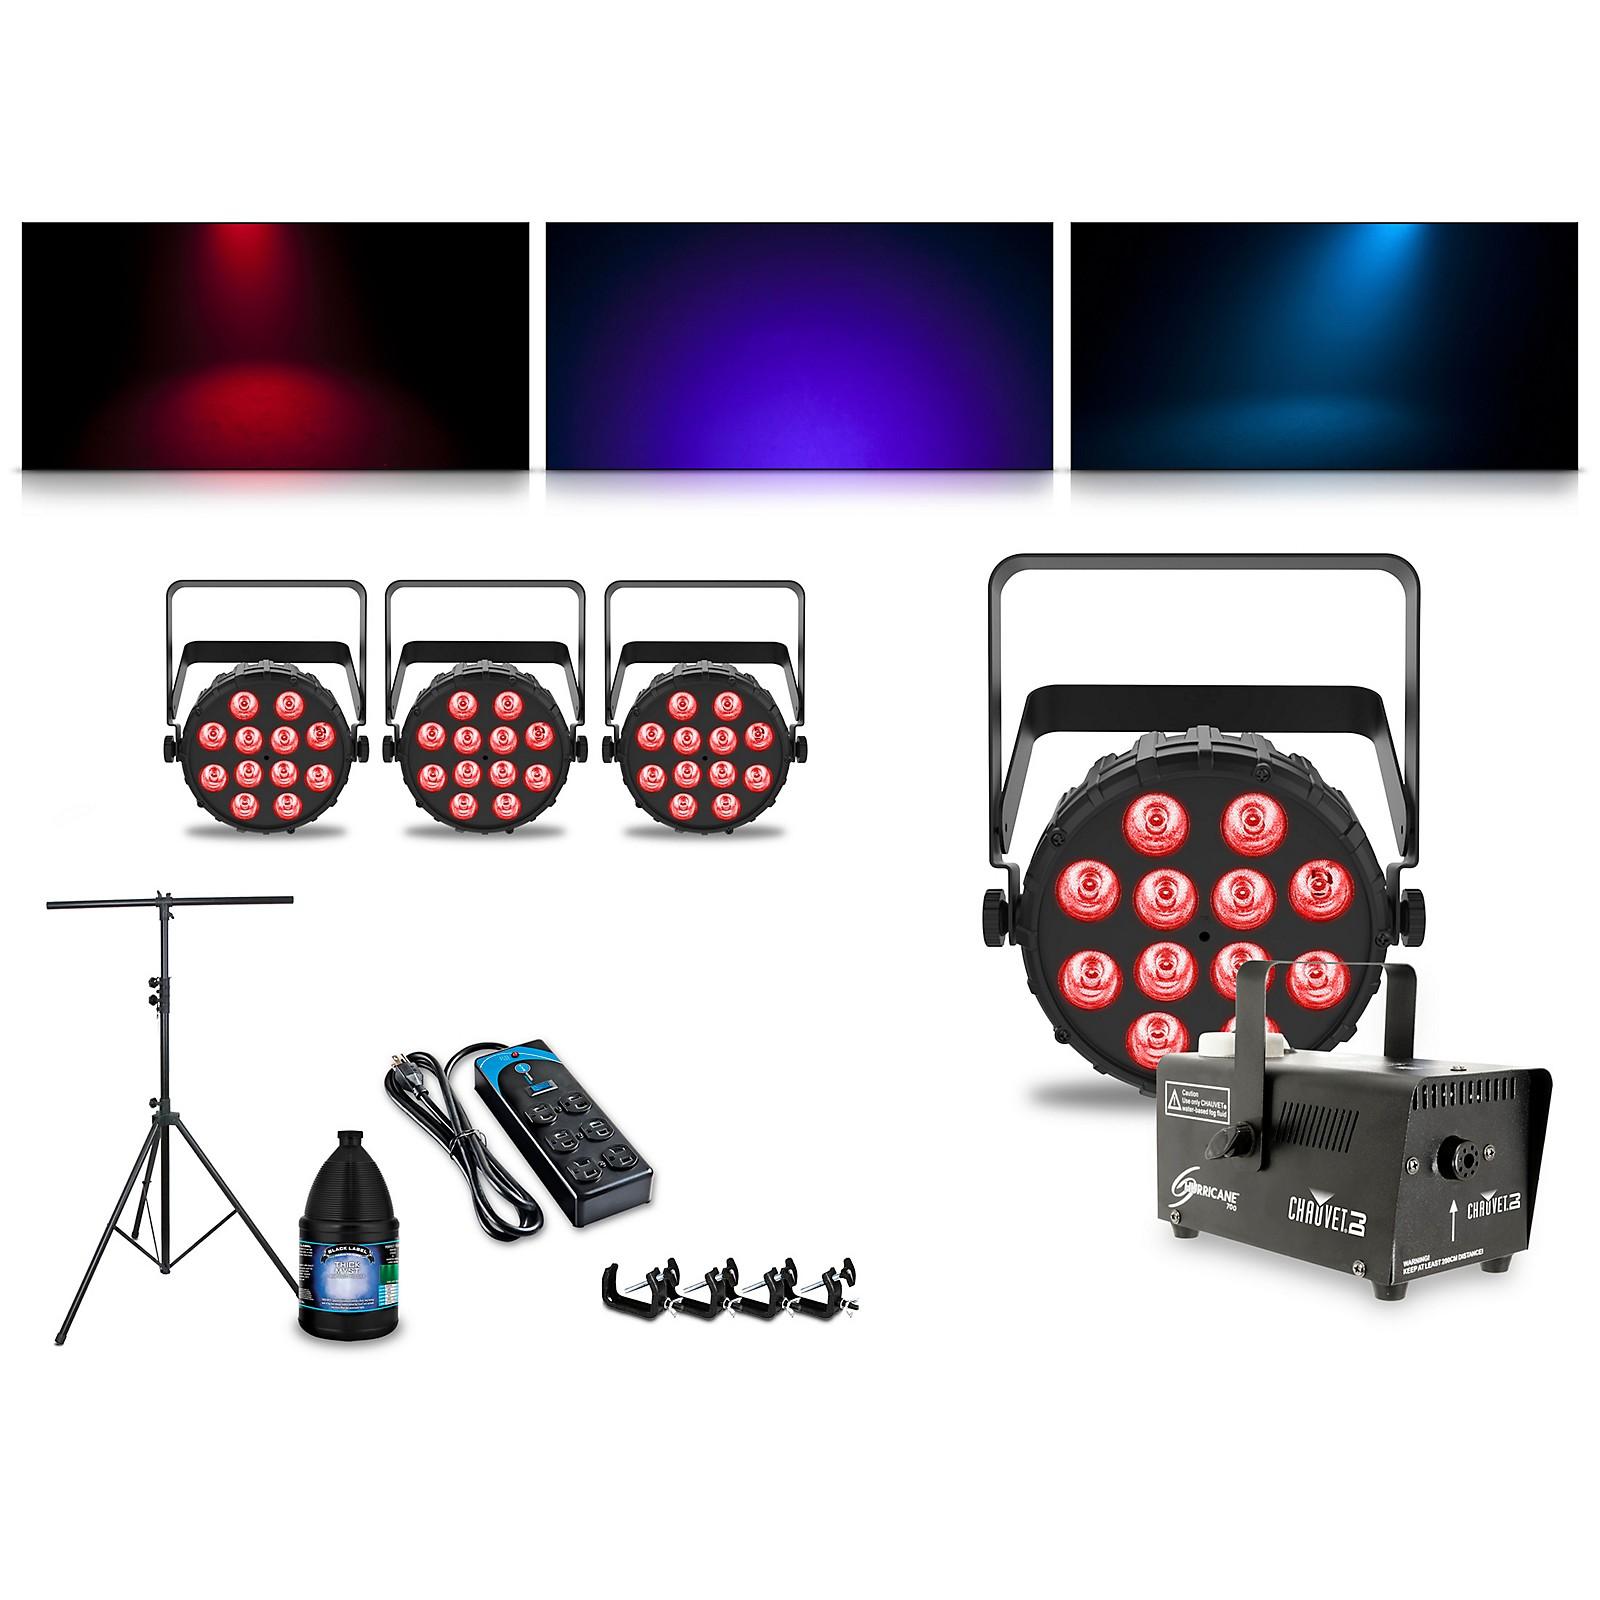 CHAUVET DJ Complete Lighting Package with Two SlimPAR T12 BT, Two SlimPAR Q12 BT and Hurricane 700 Fog Machine